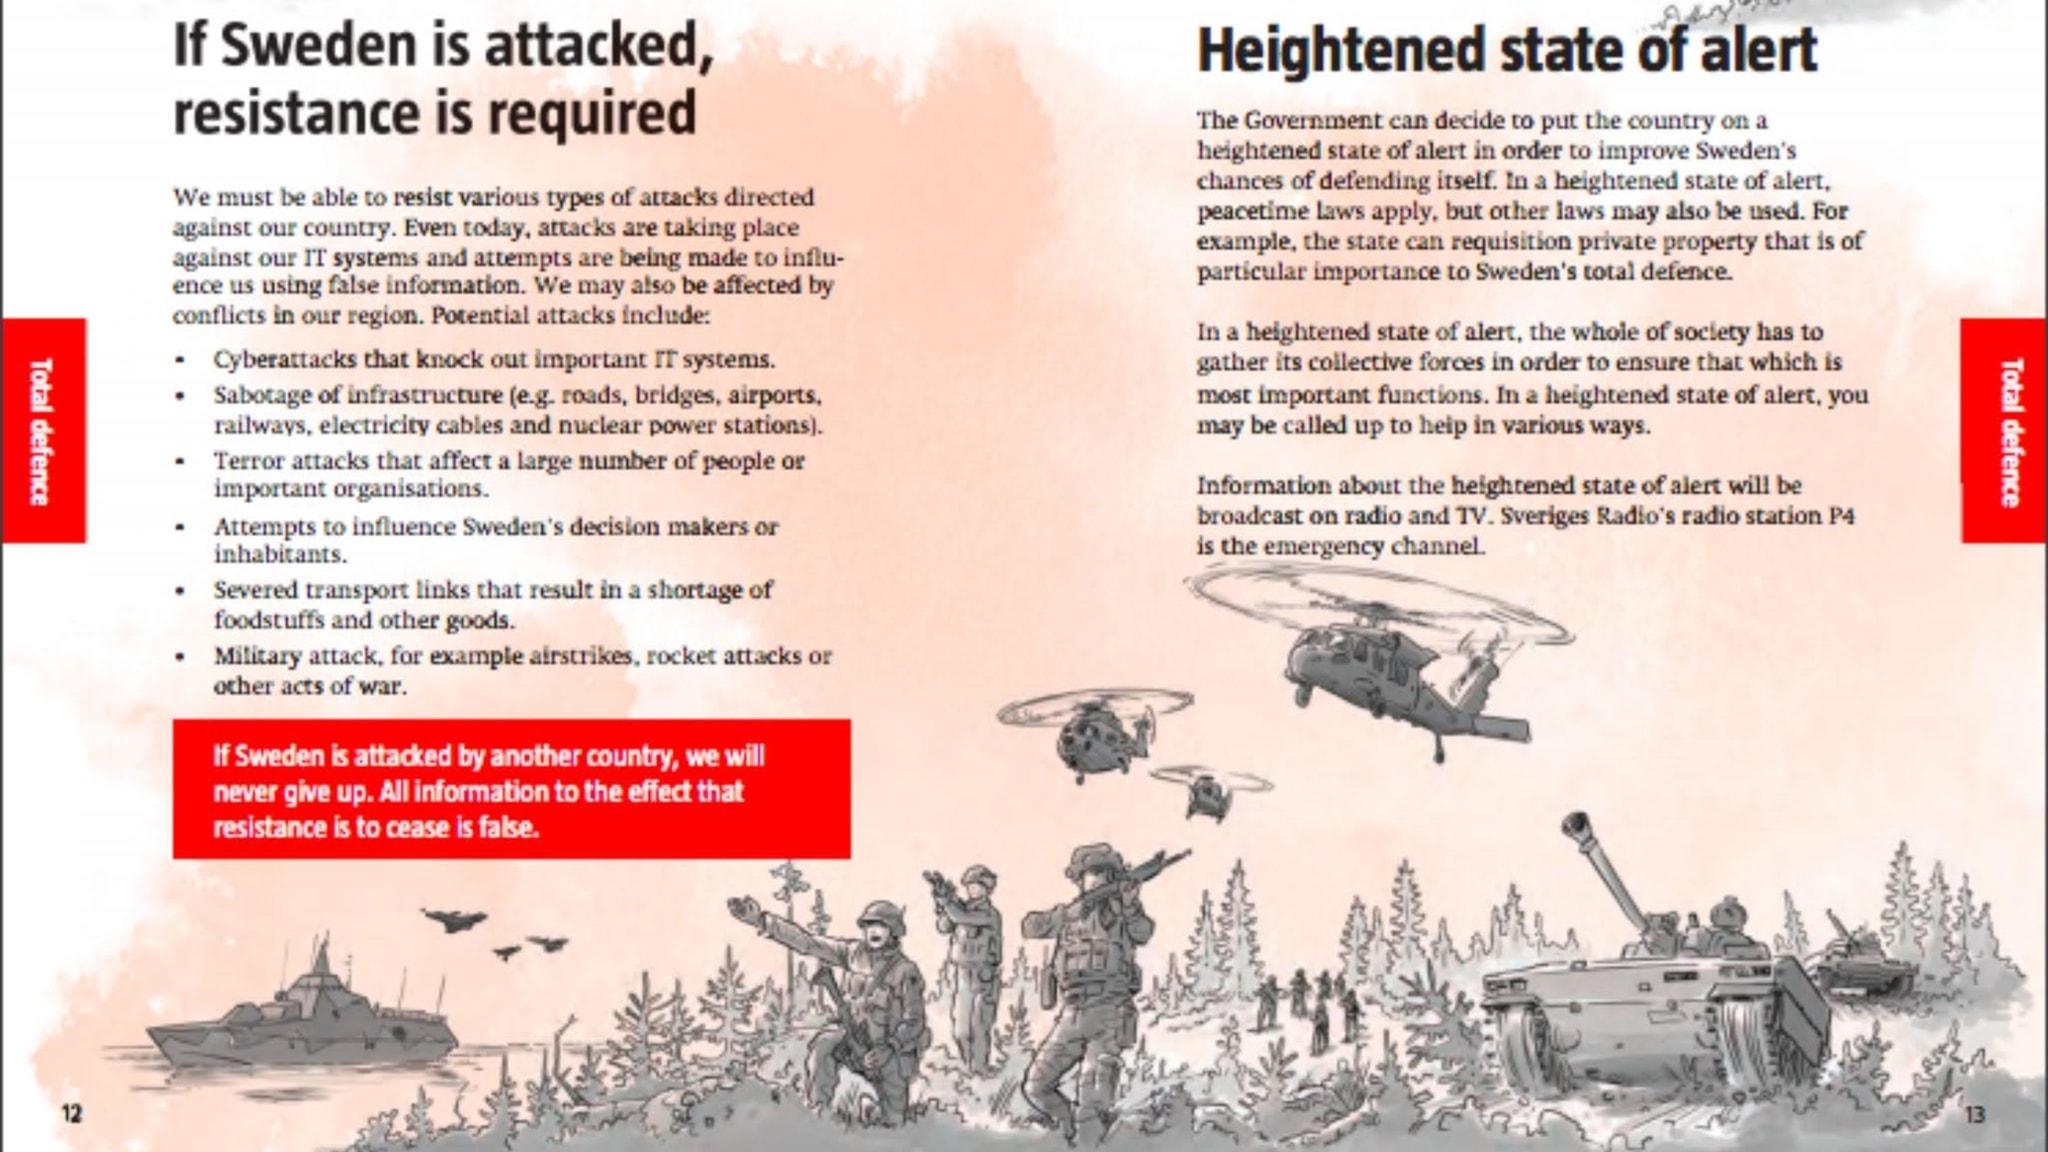 Radio Sweden Weekly: Return of 'prepare for war' leaflet, Olof Palme